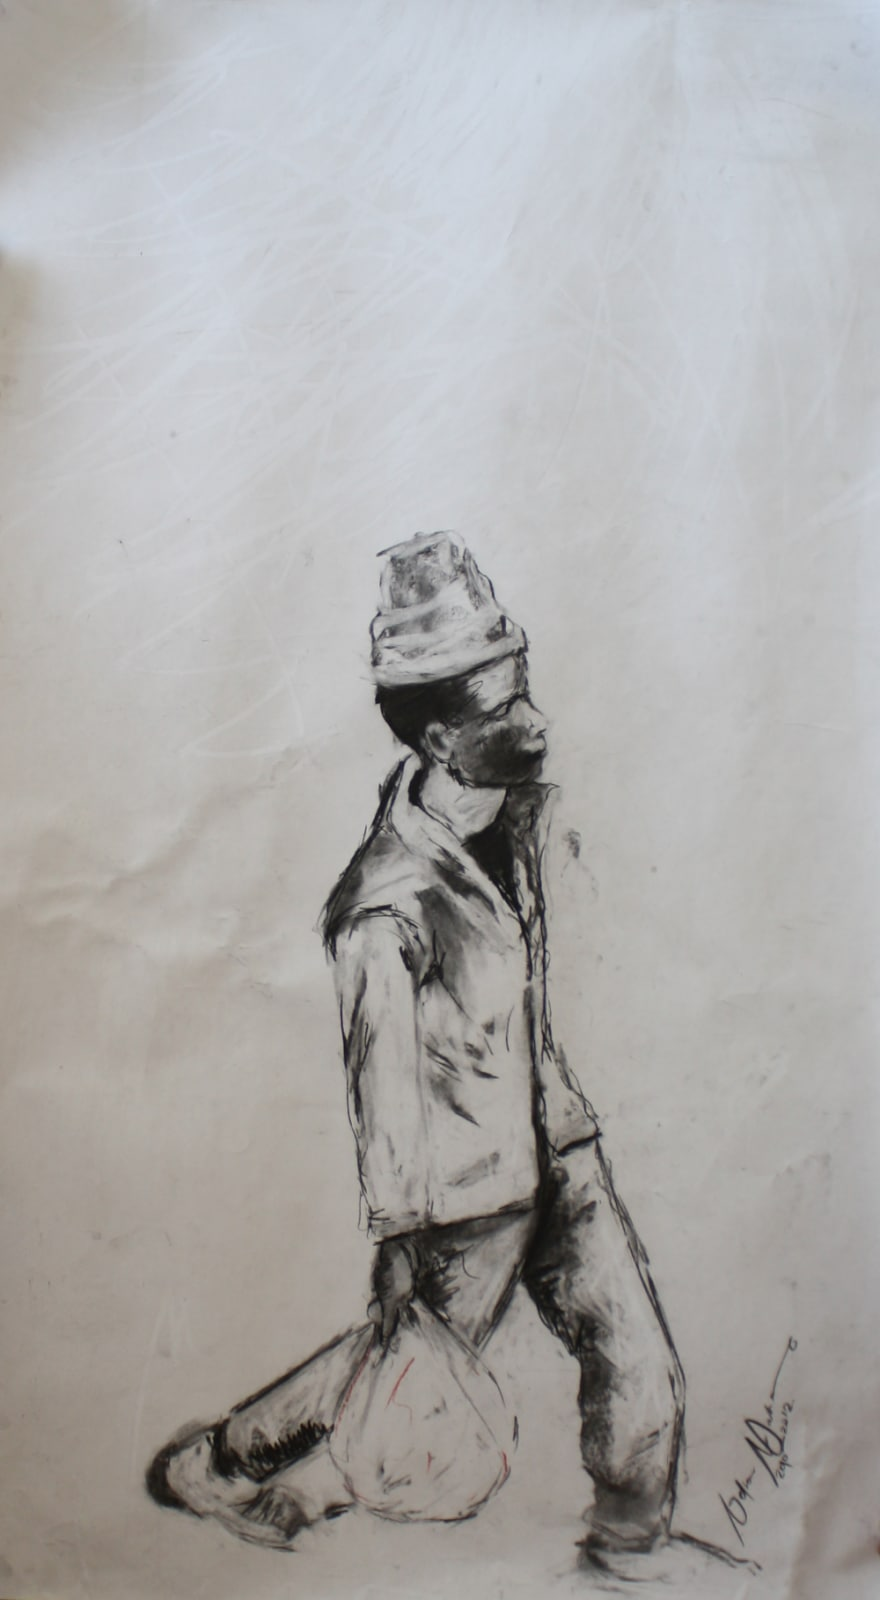 Nelson Makamo, That Dude Walking, 2012